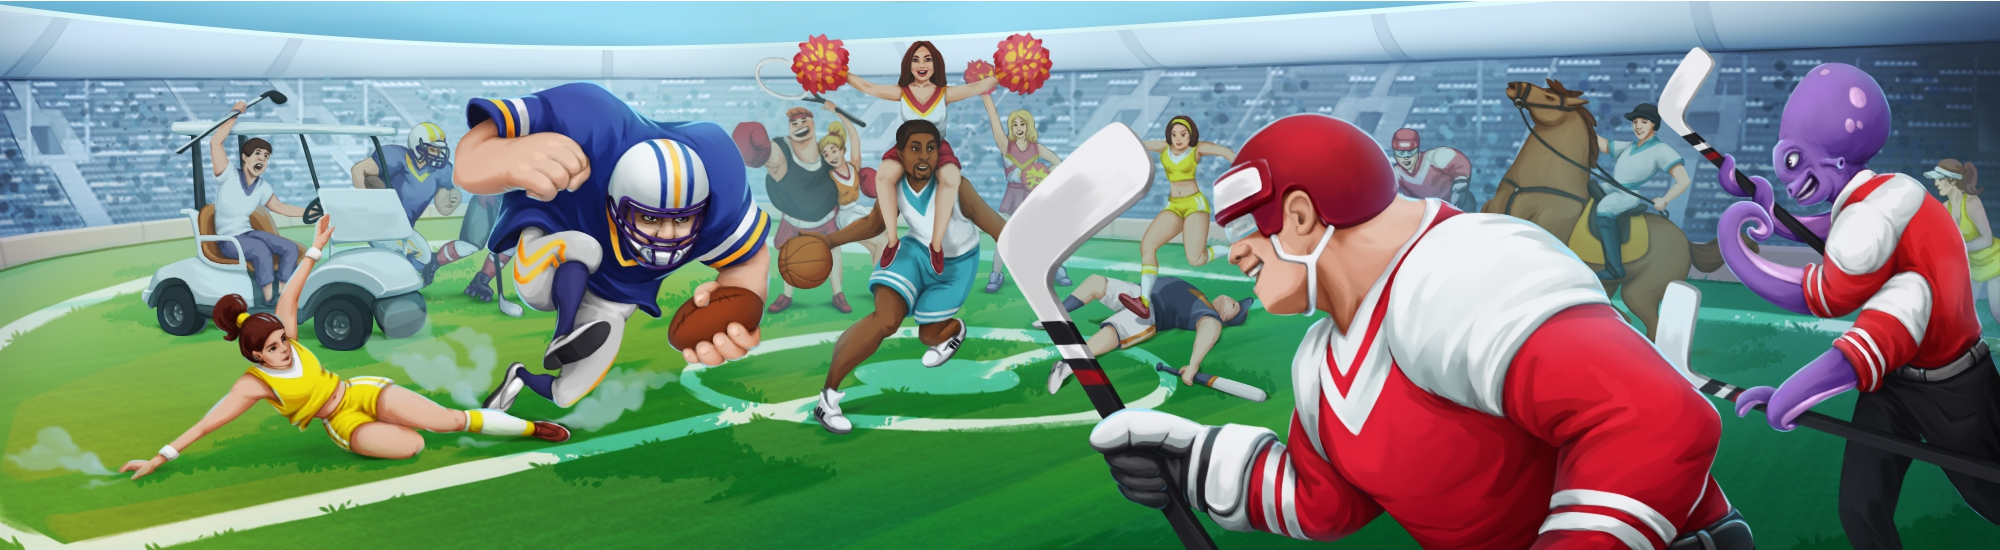 500% ребейт +5% кэшбэк в спорте